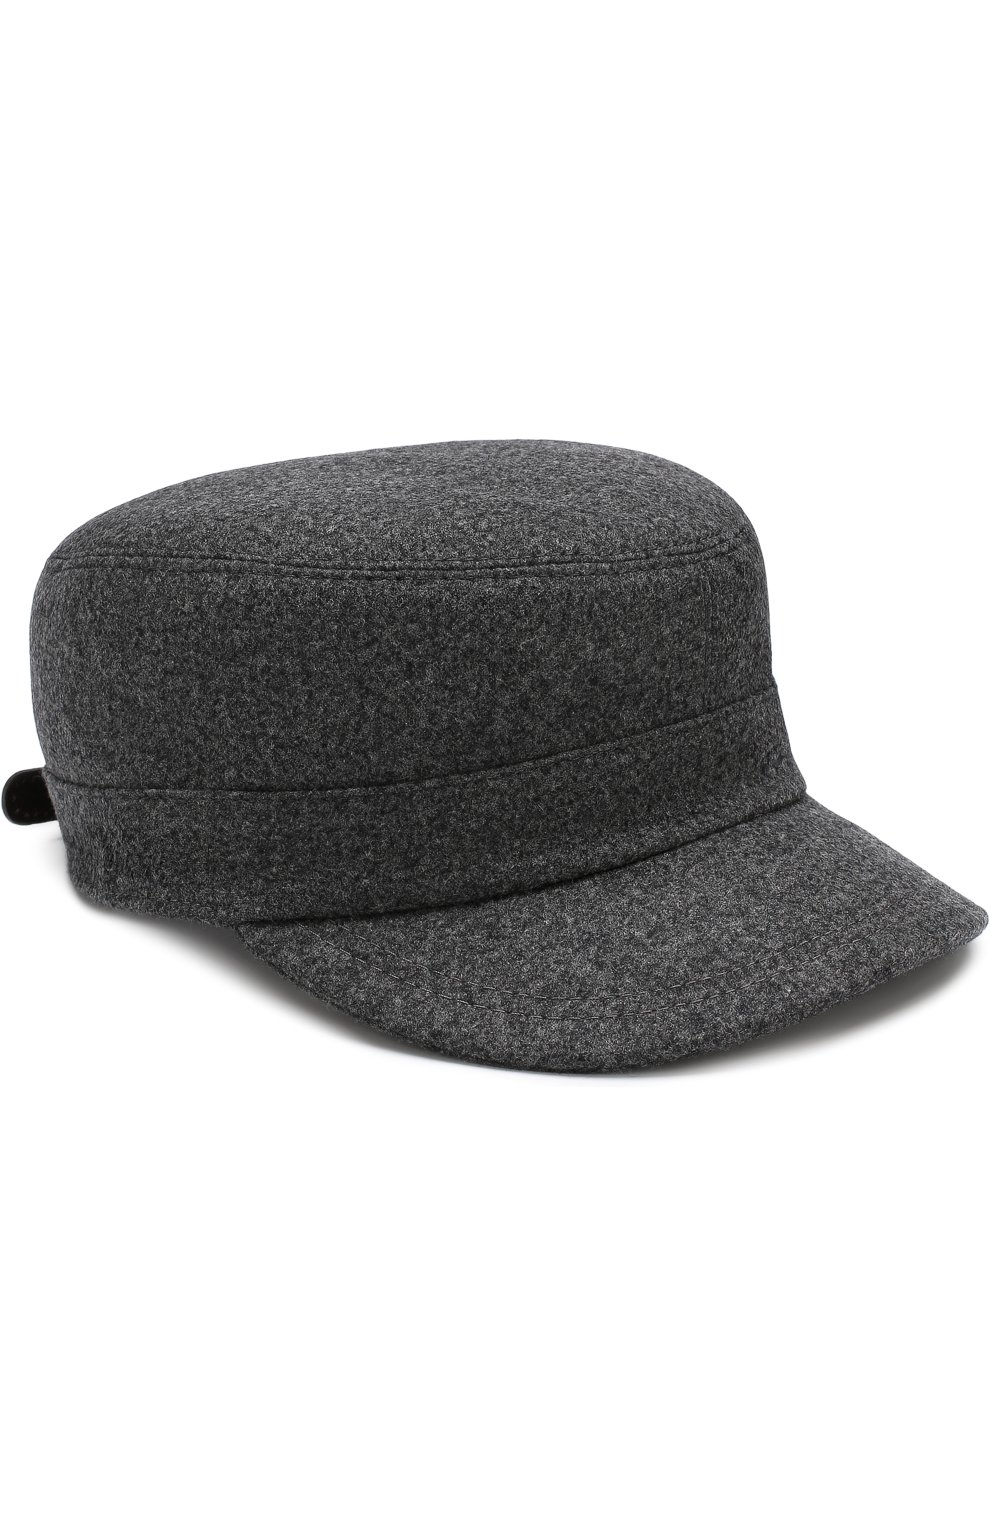 Мужская шерстяная кепка BRUNELLO CUCINELLI серого цвета, арт. M038P9955 | Фото 1